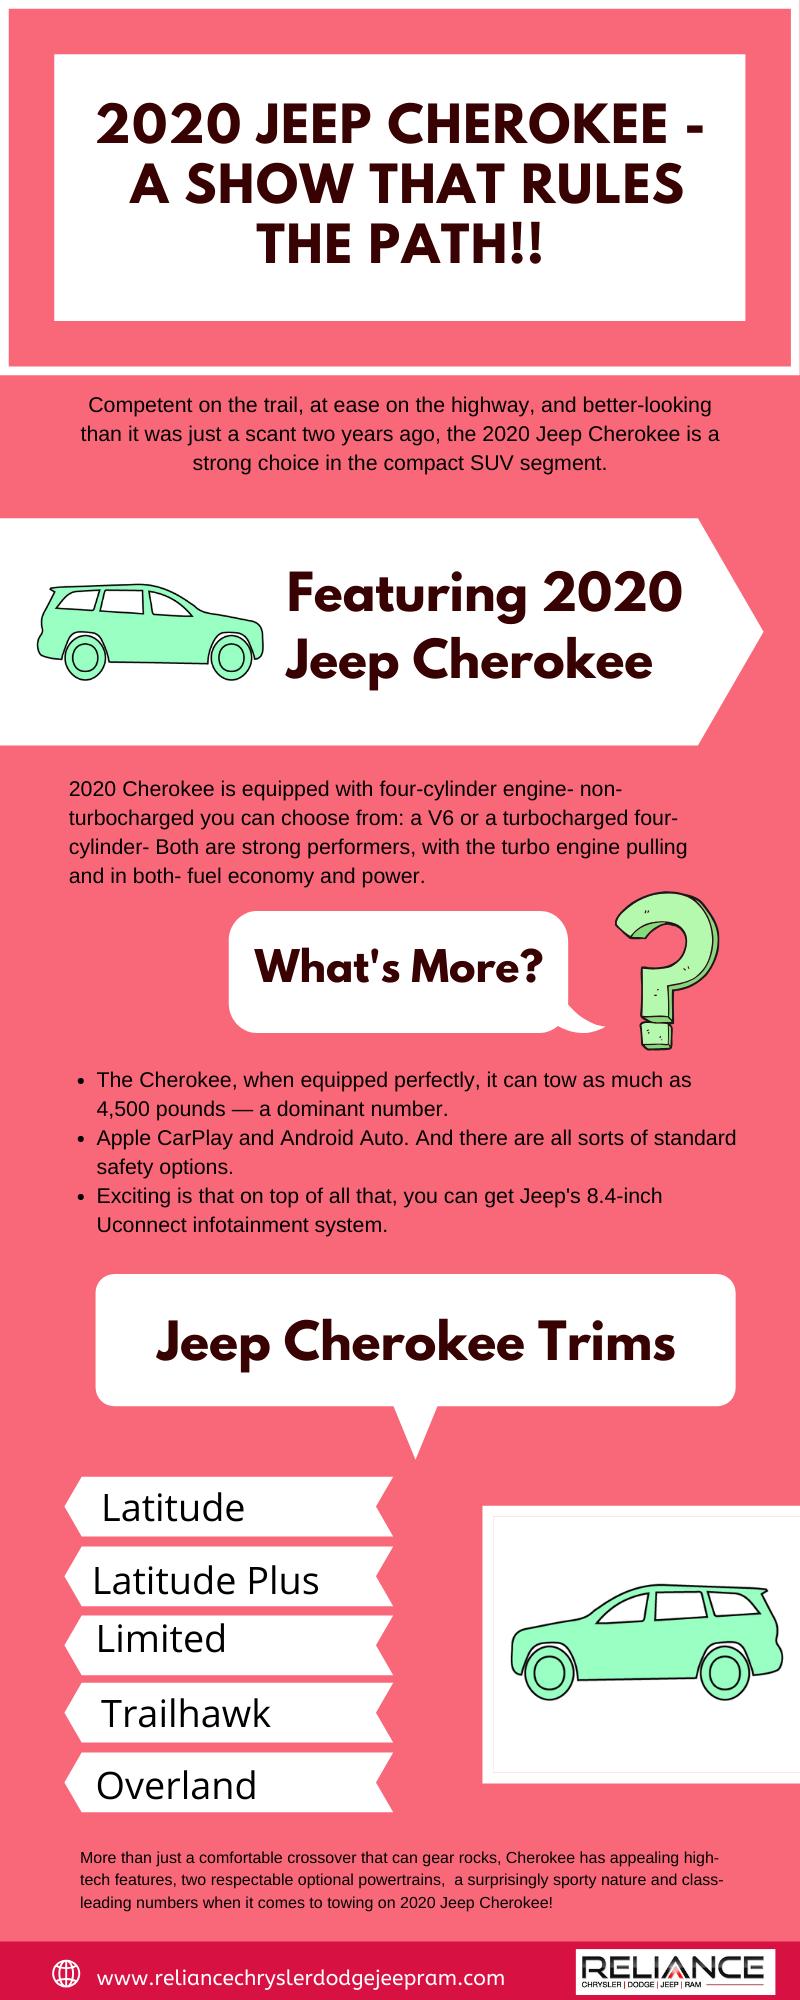 2020 Jeep Cherokee - Reliance Bay City Texas